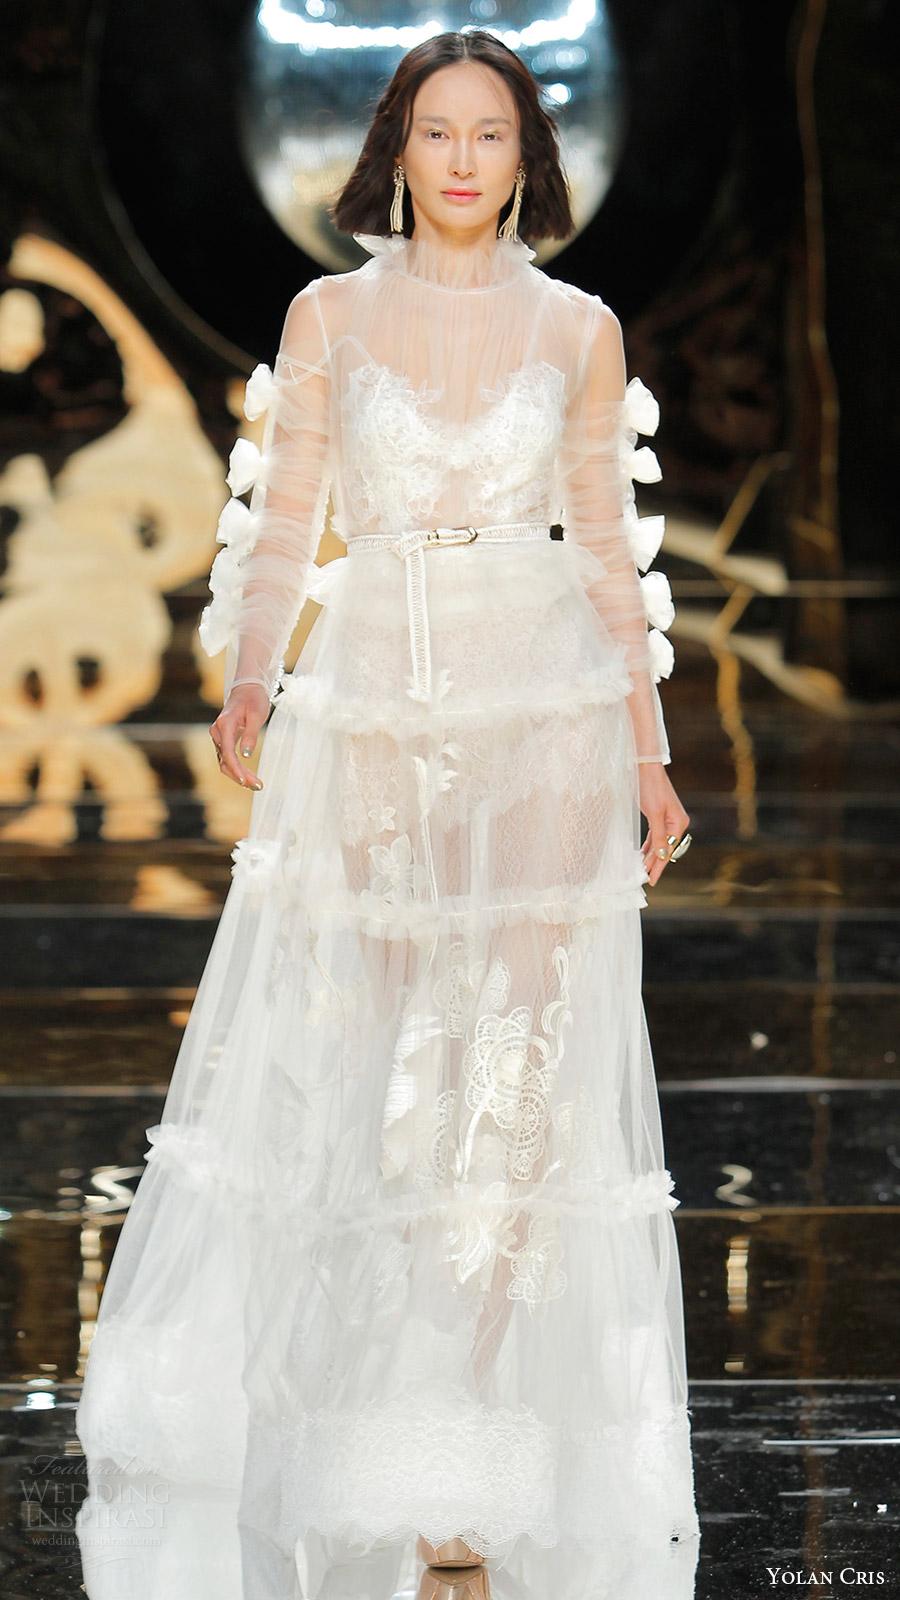 Yolan Cris Bridal 2017 Wedding Dresses - crazyforus